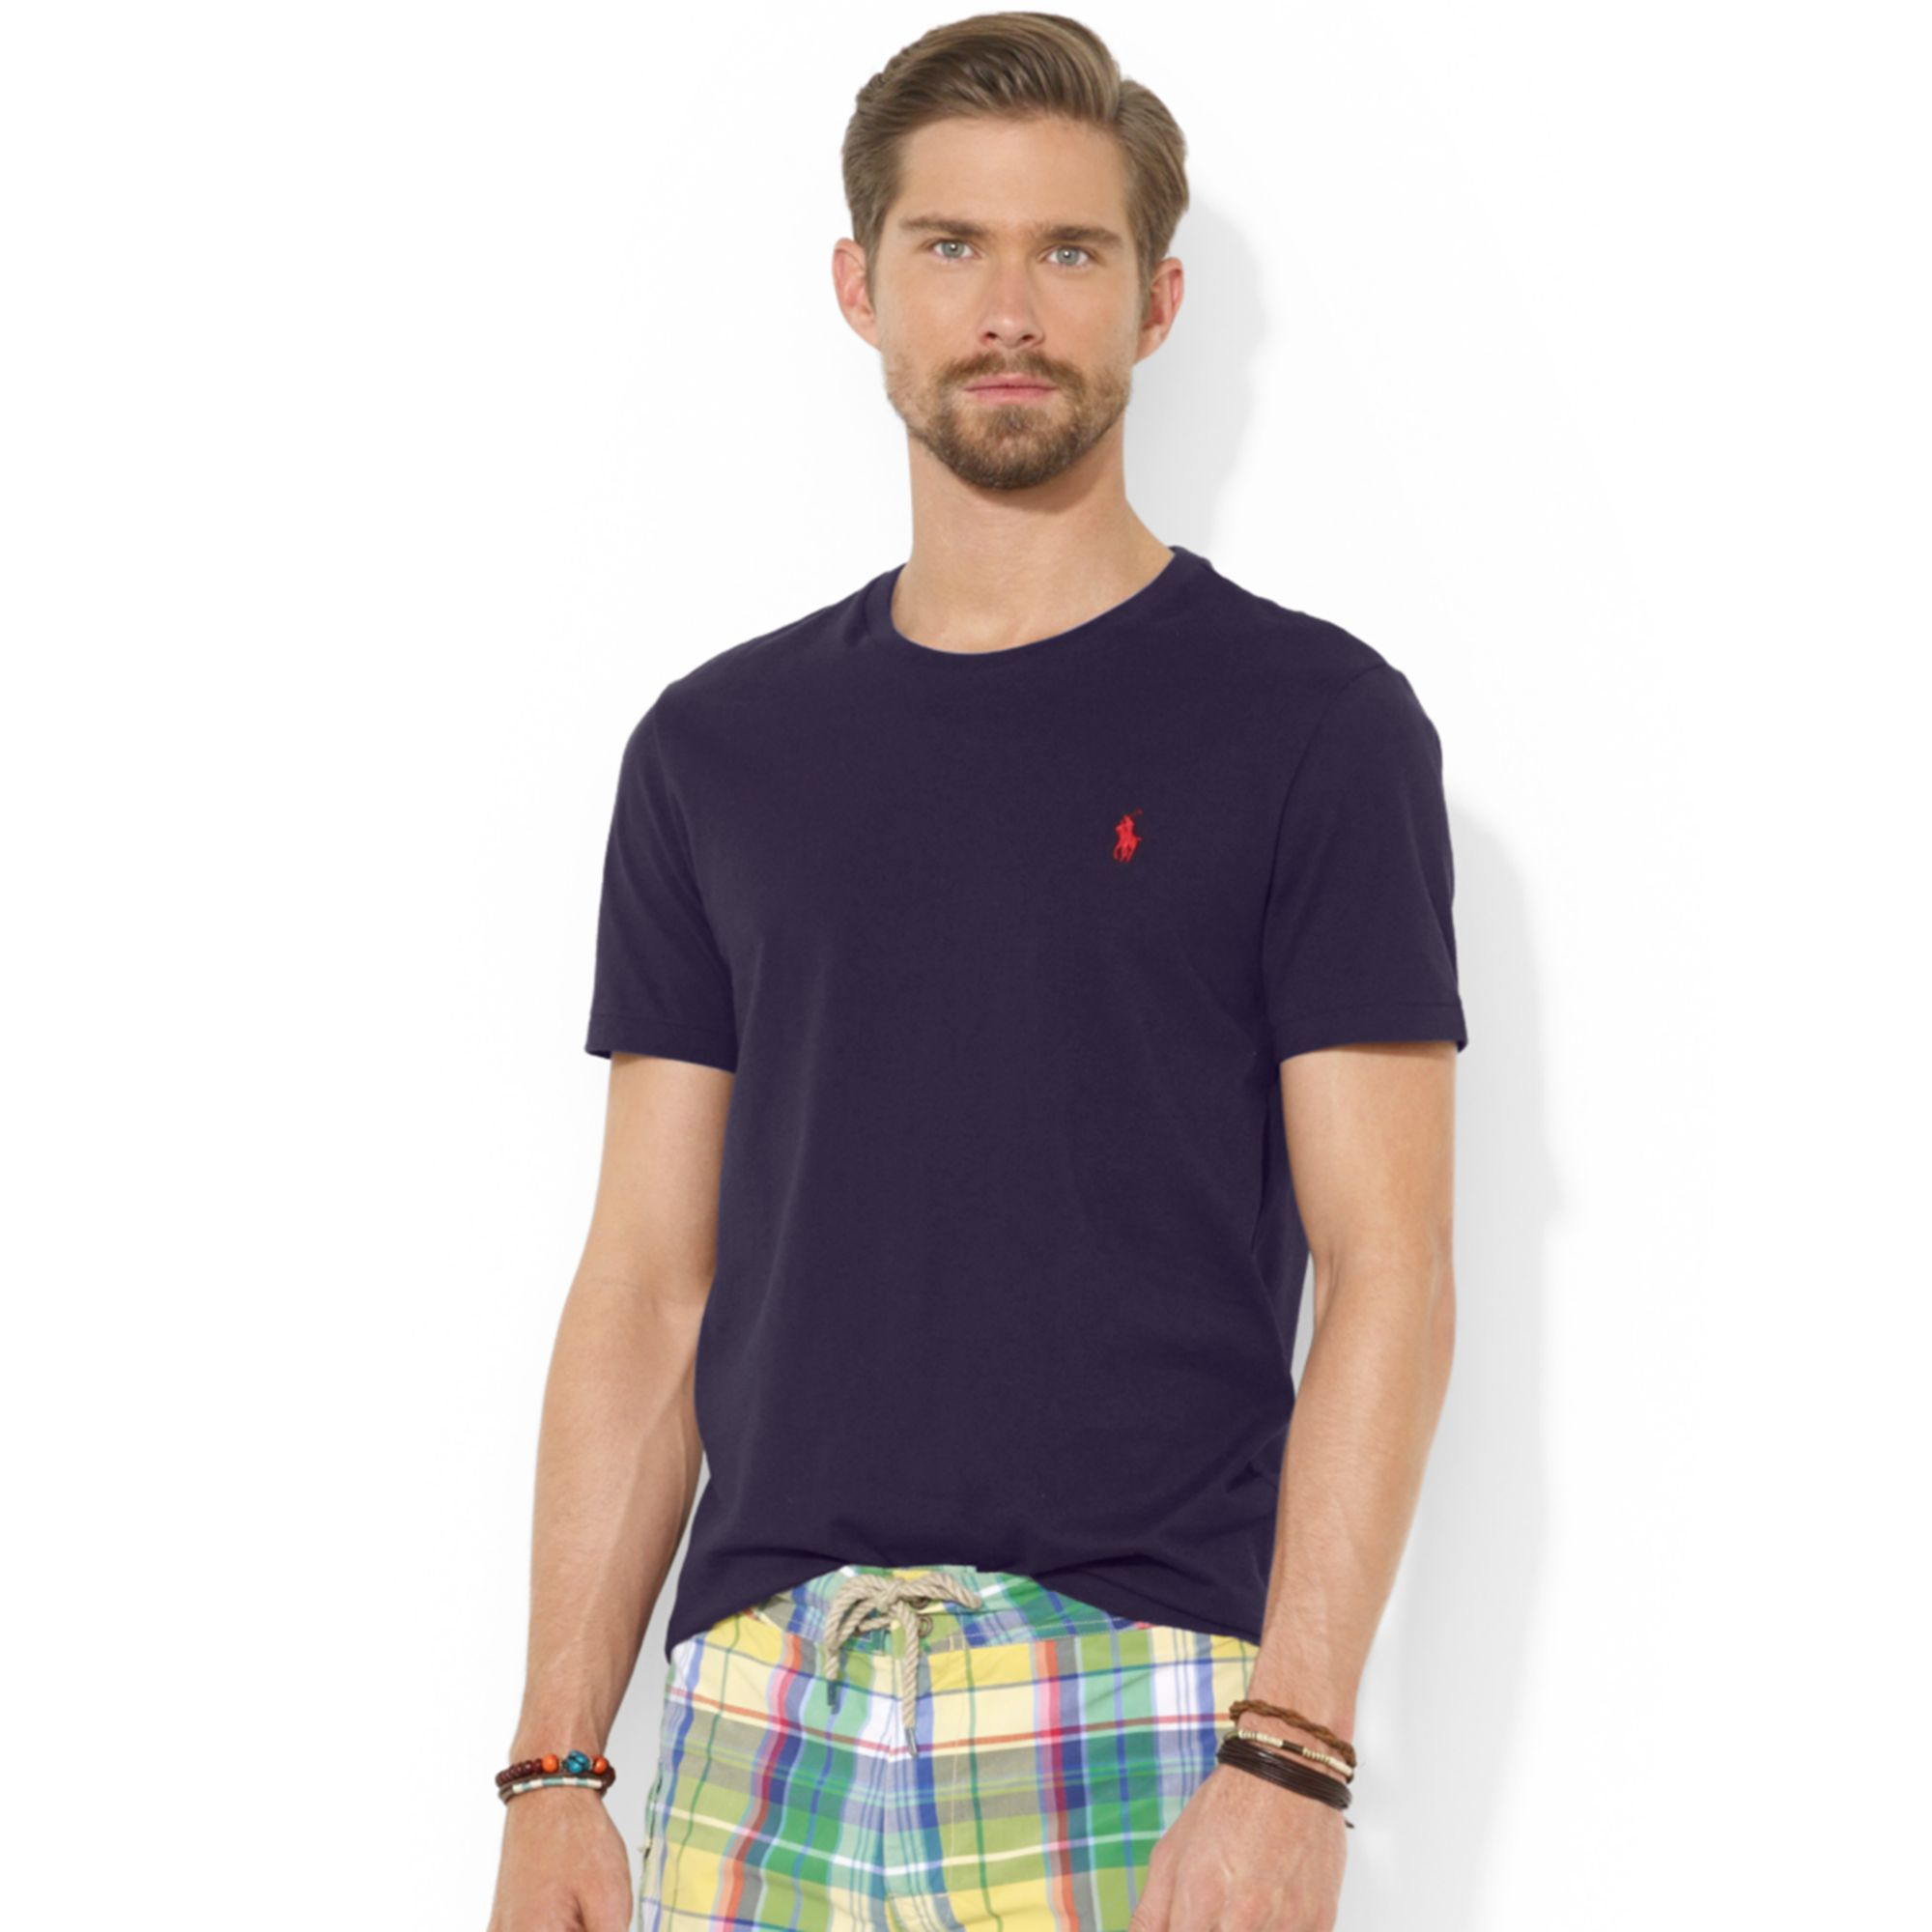 Ralph lauren polo custom fit cotton jersey t shirt in for Polo custom fit t shirts